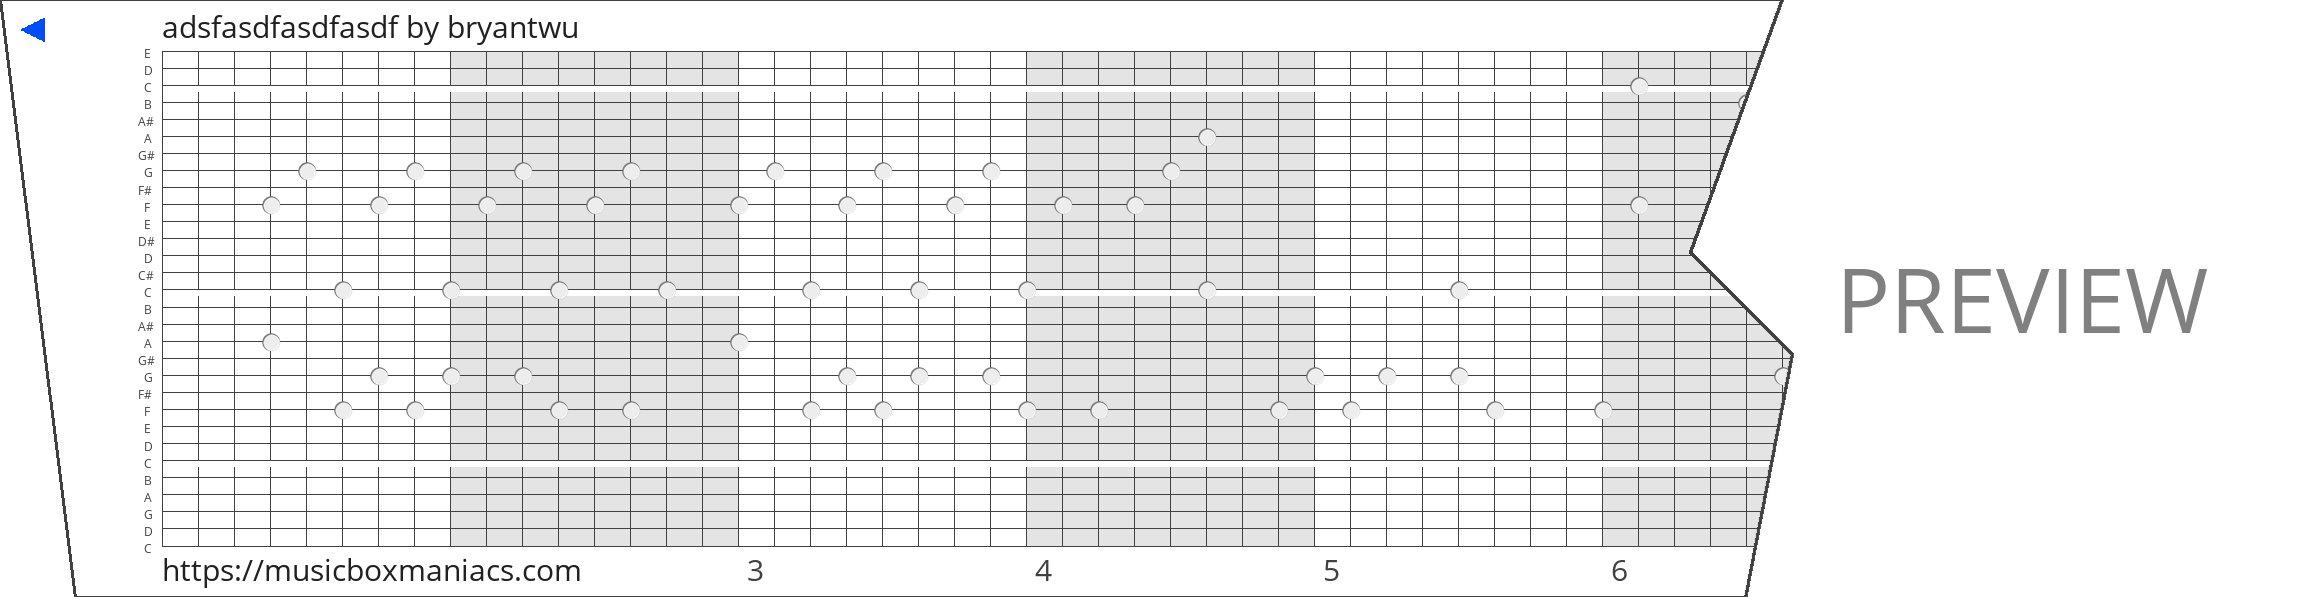 adsfasdfasdfasdf 30 note music box paper strip